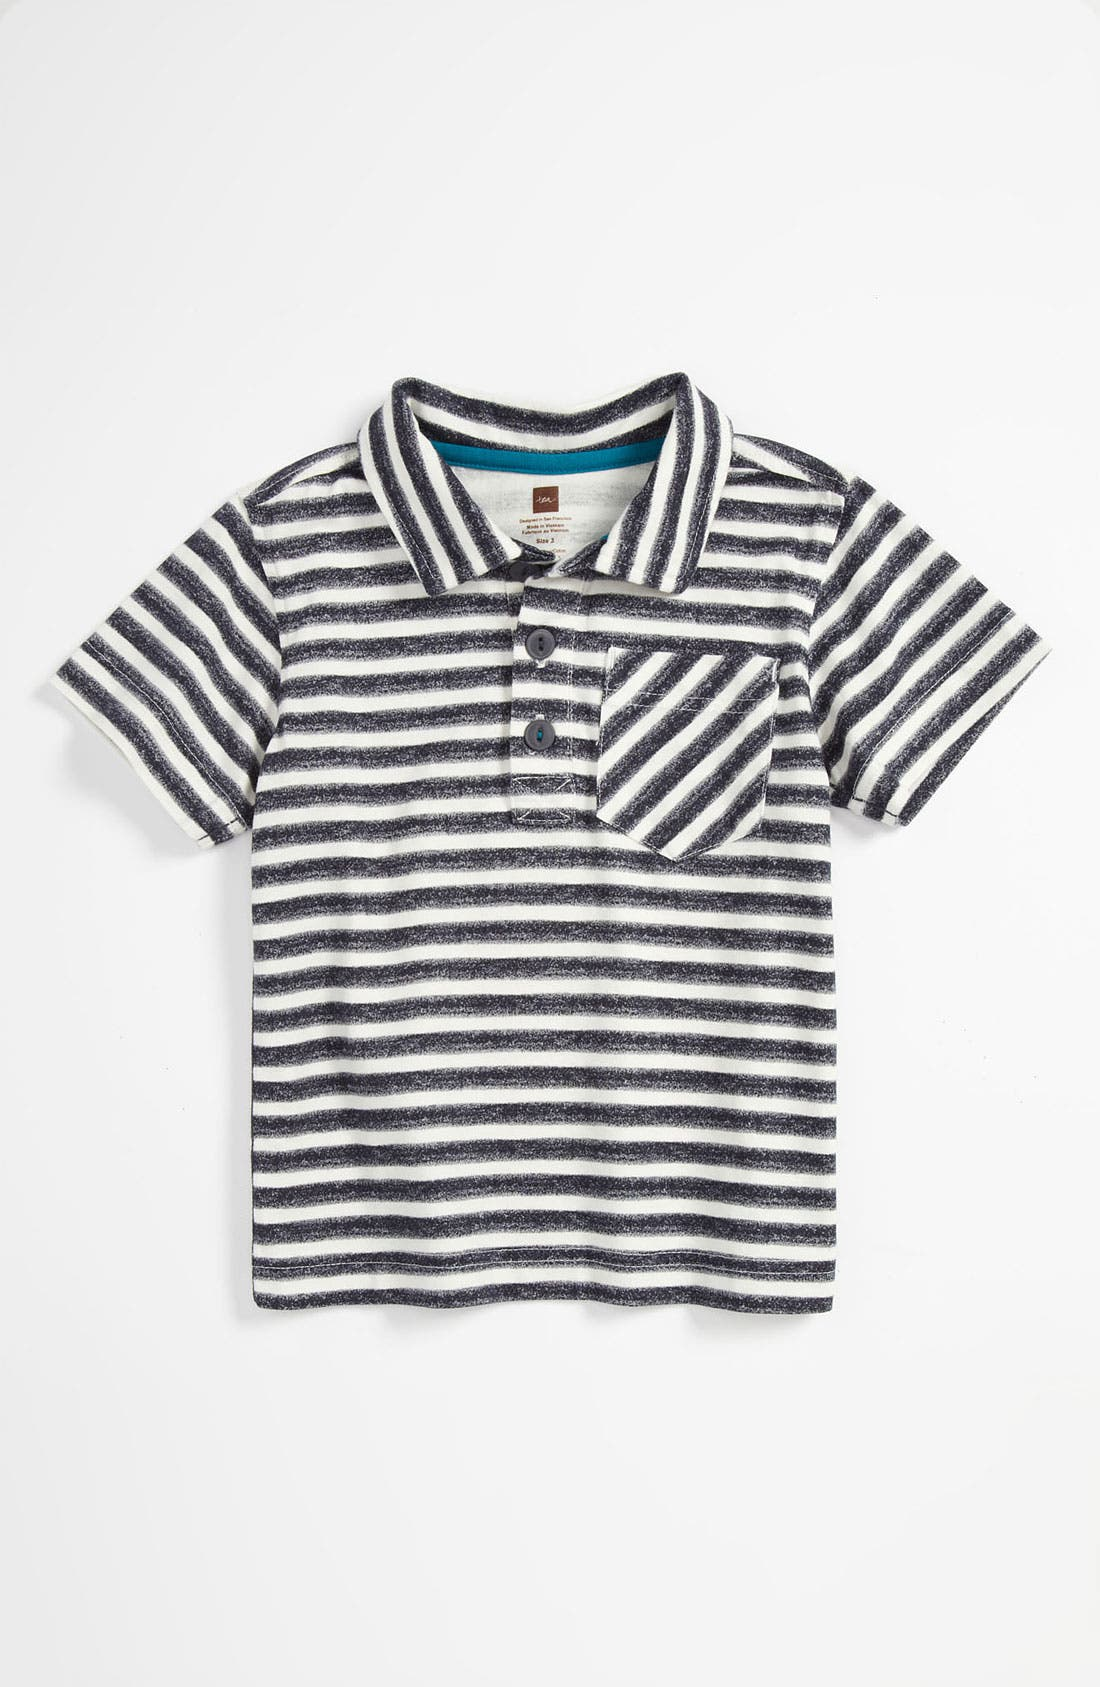 Alternate Image 1 Selected - Tea Collection 'Zebra Stripe' Polo Shirt (Toddler)